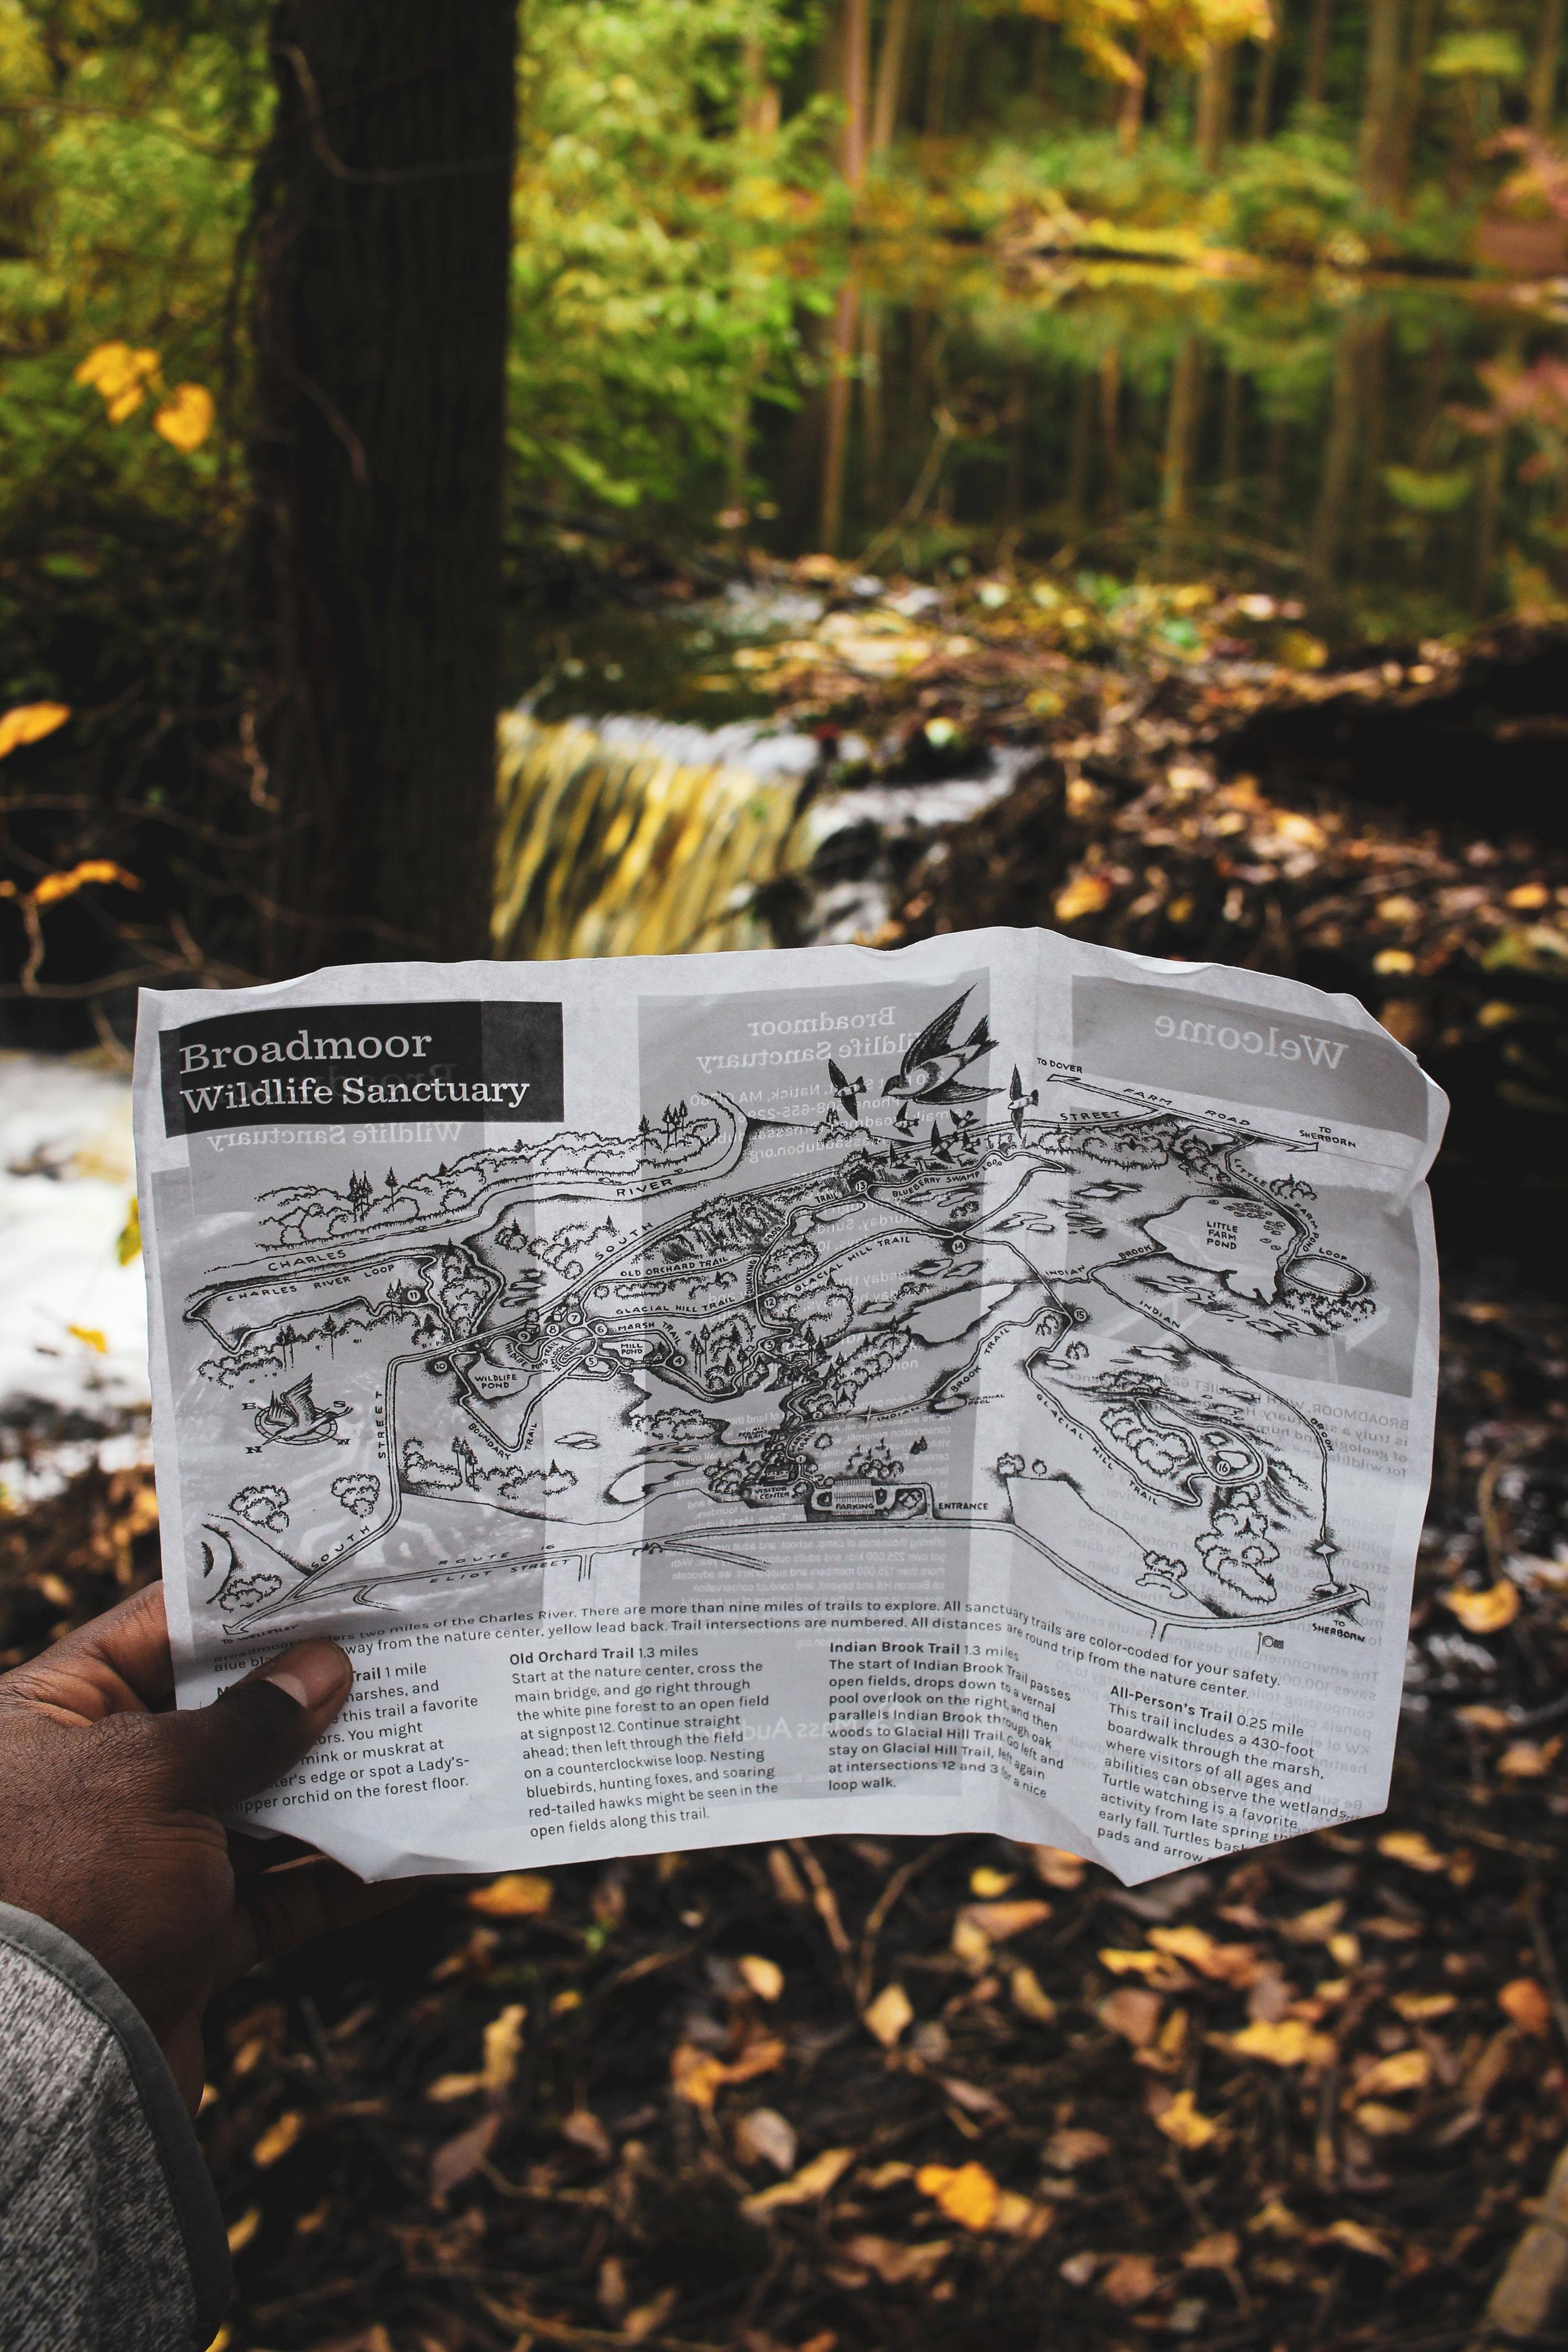 Broadmoor Wildlife Sanctuary TWG-25.jpg